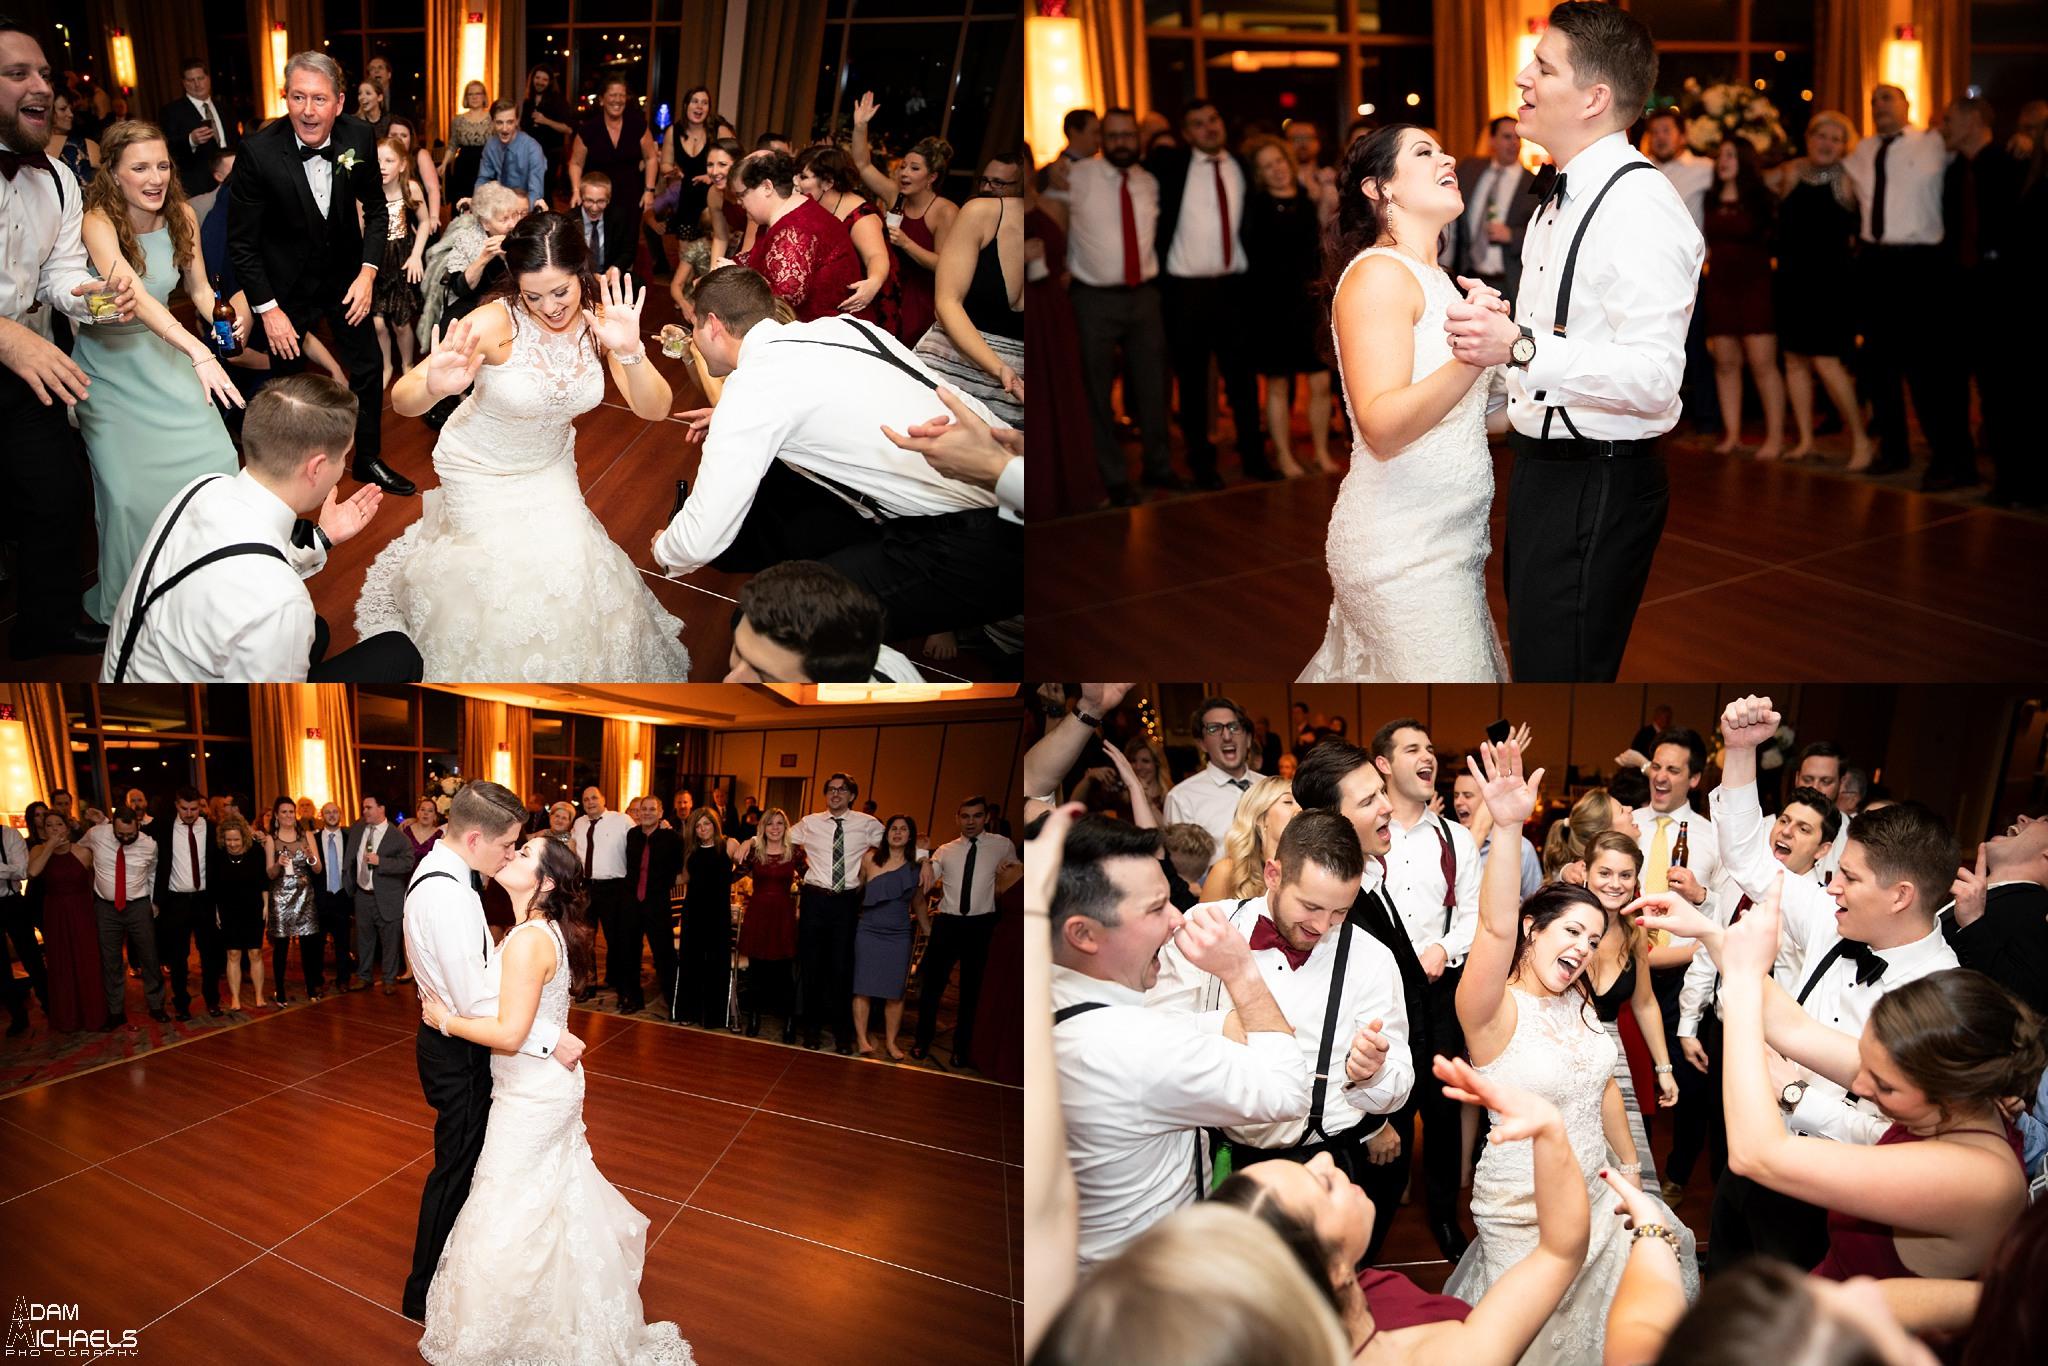 Wyndham Grand Pittsburgh Wedding Reception Pictures_3039.jpg